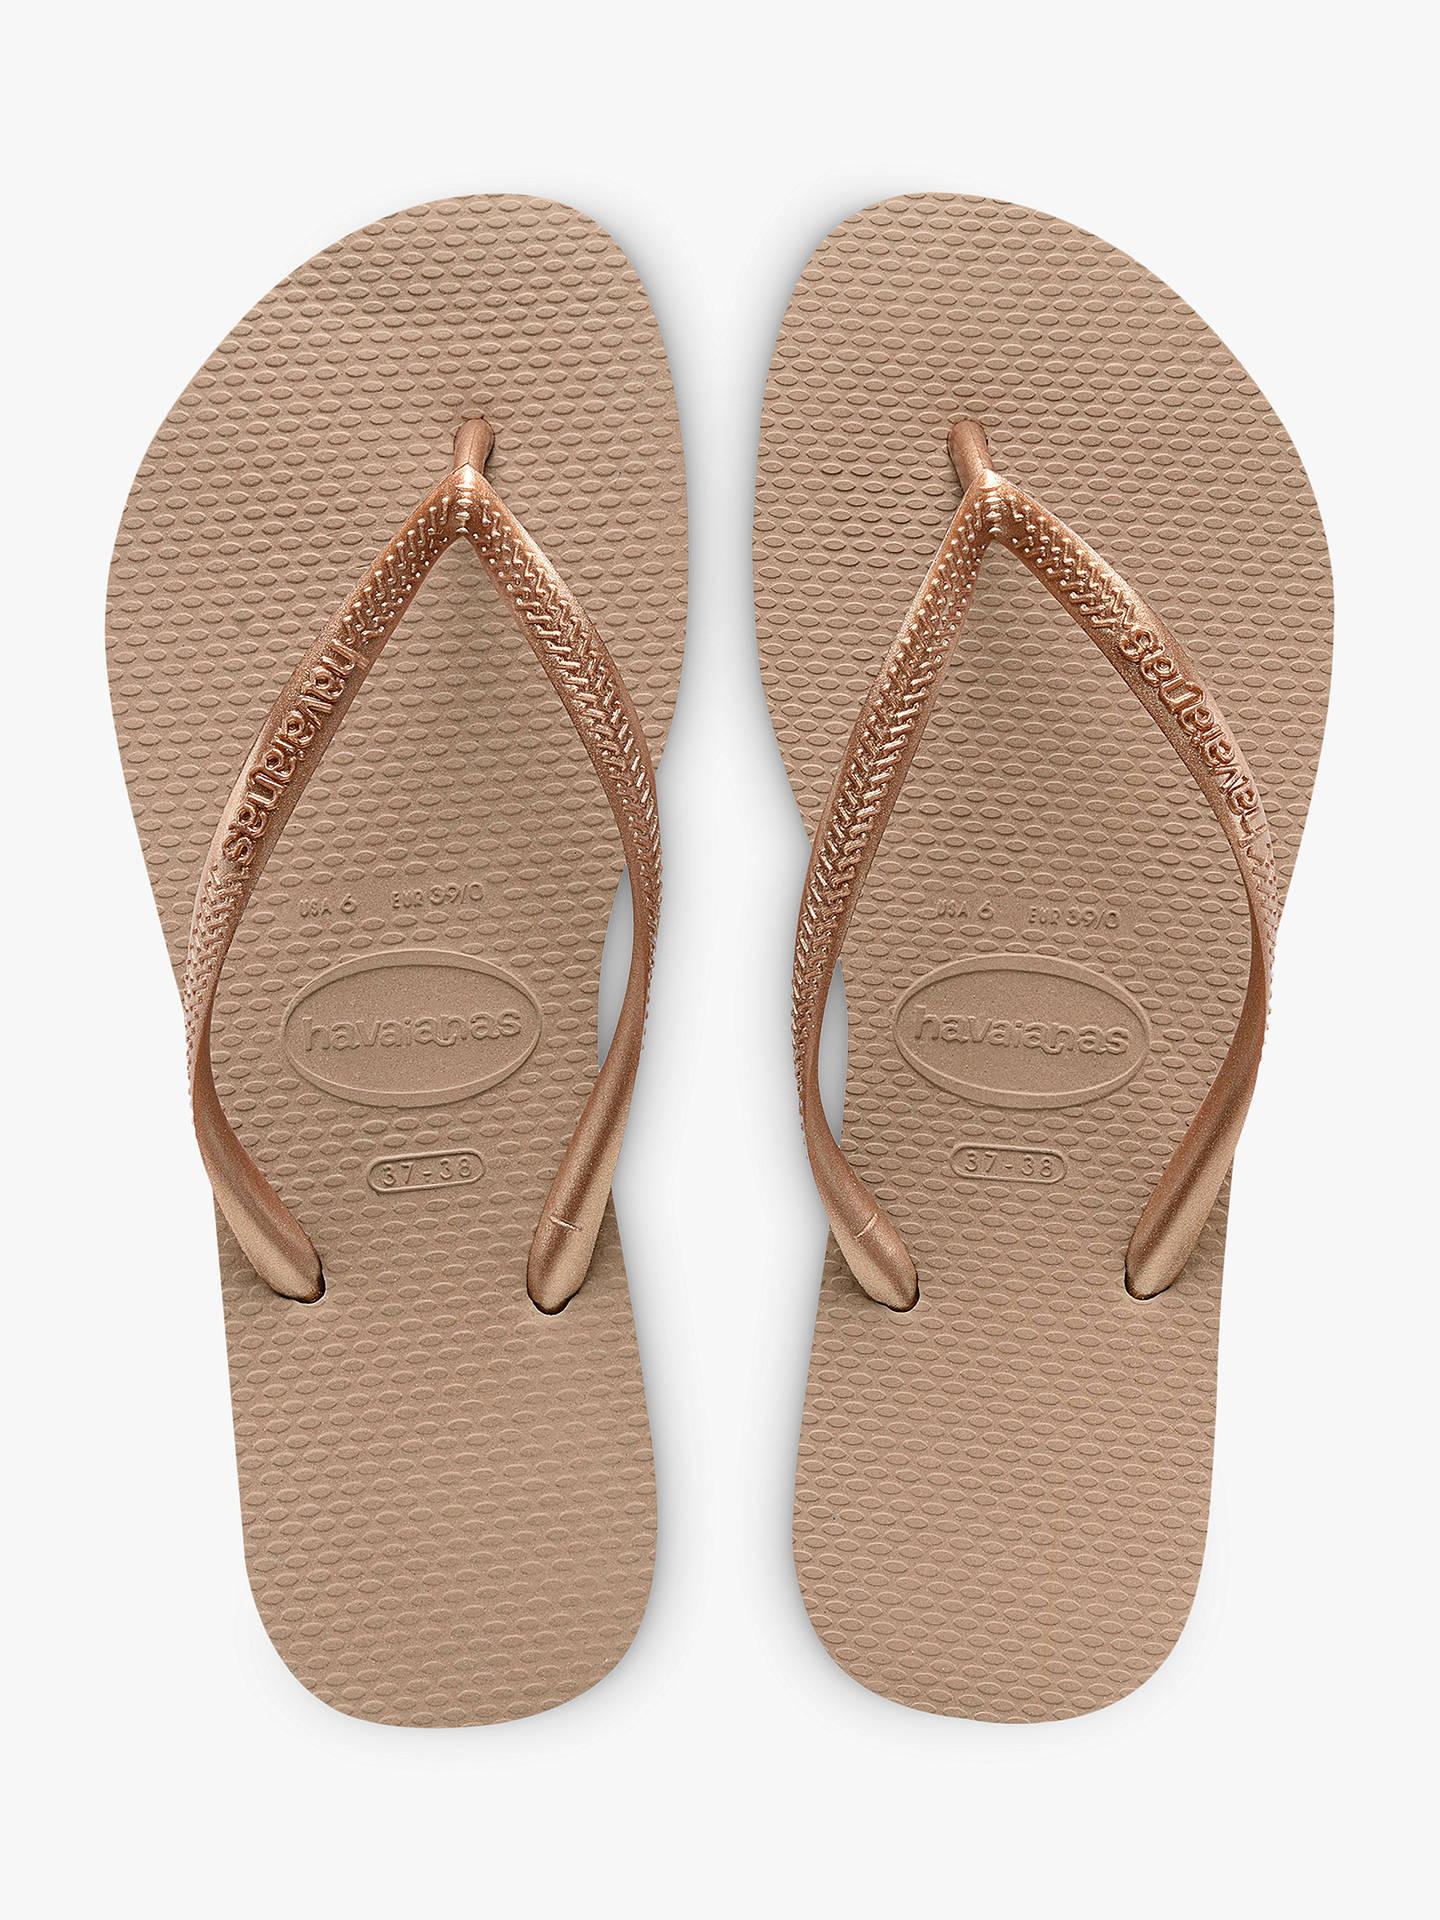 62d1bb3e7043 Havaianas Slim Flip Flops at John Lewis   Partners